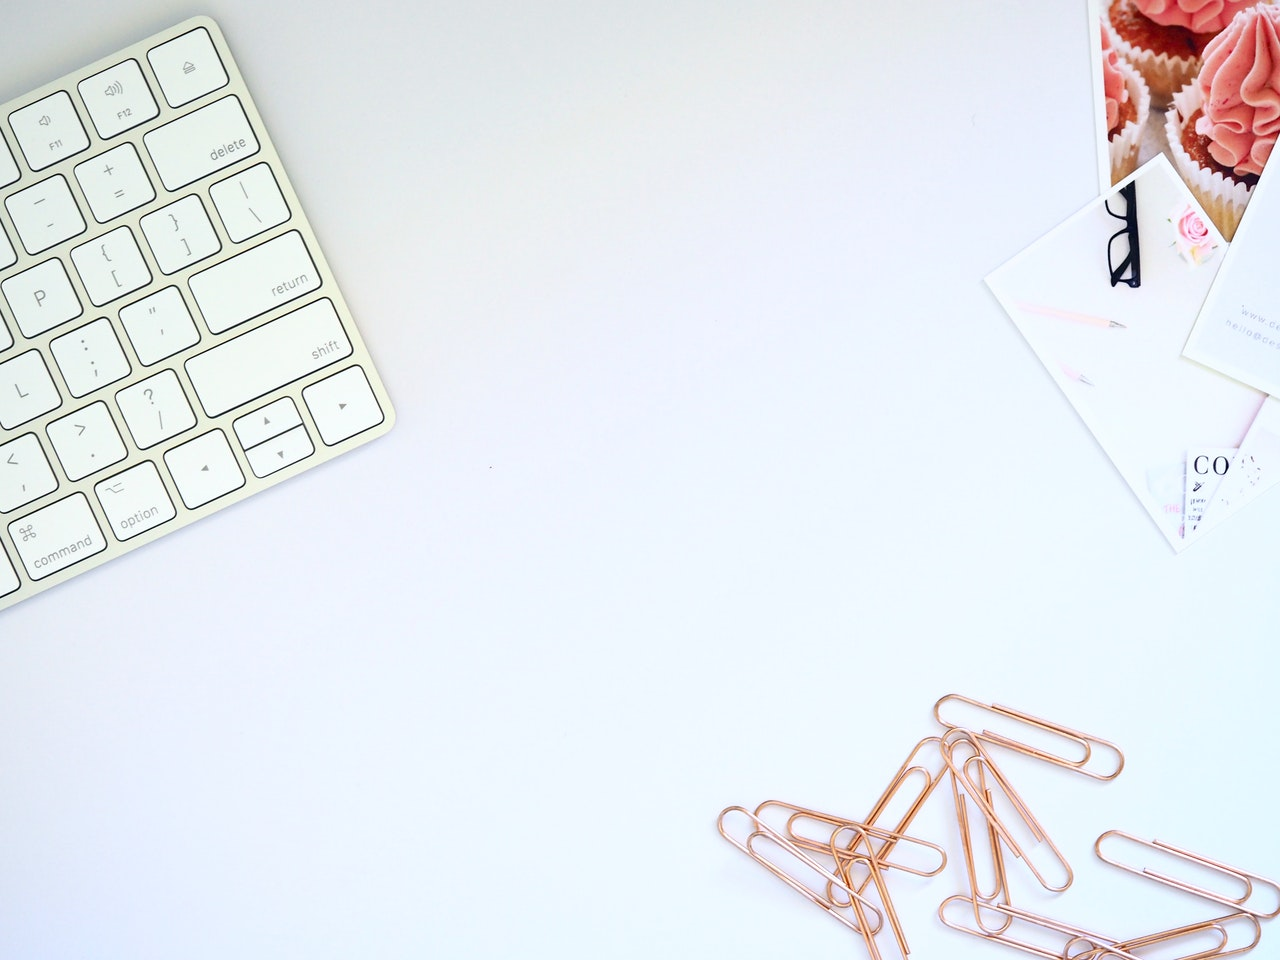 Desk Photo from Plush Design Studio from Pexels